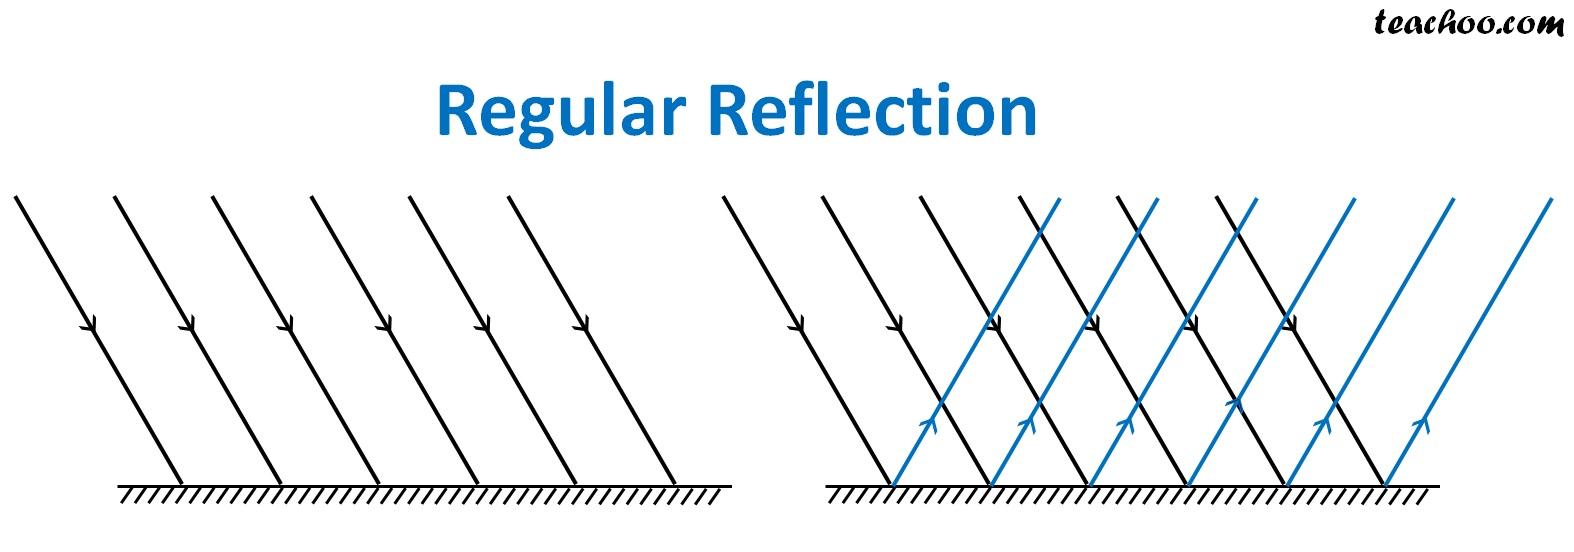 Regular Reflection - Teachoo.jpg